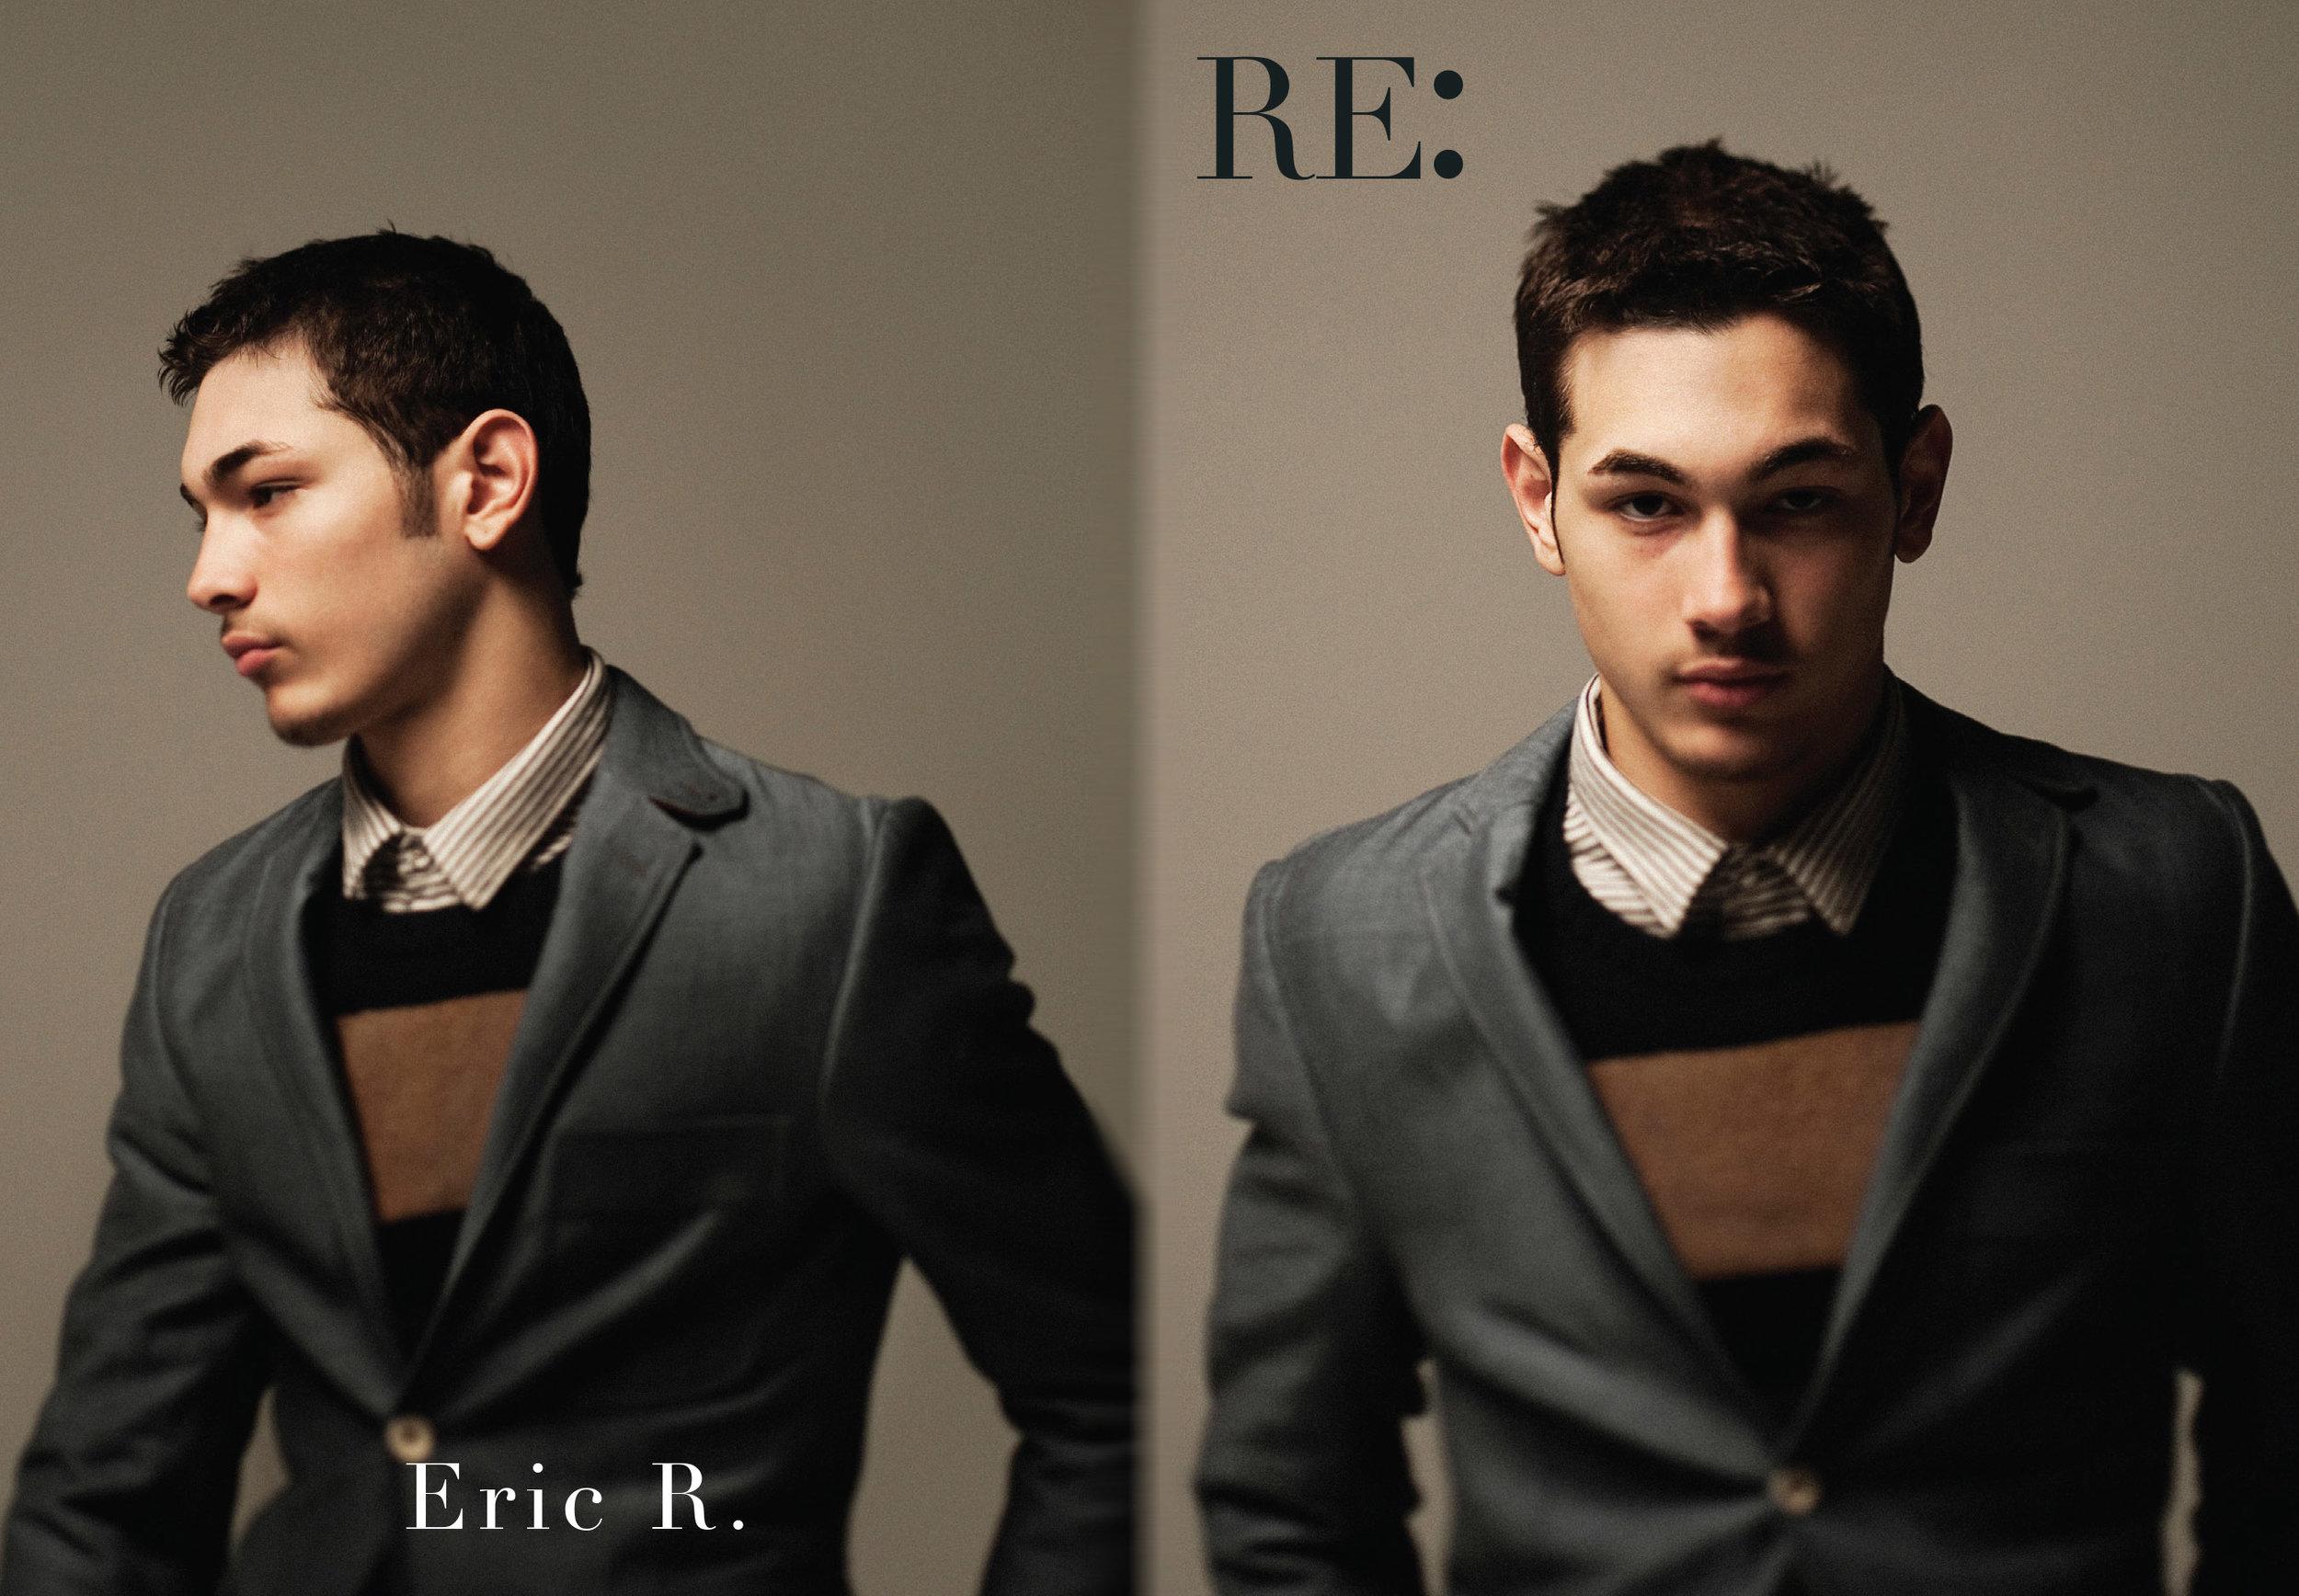 Eric R NB-1 copy.jpg